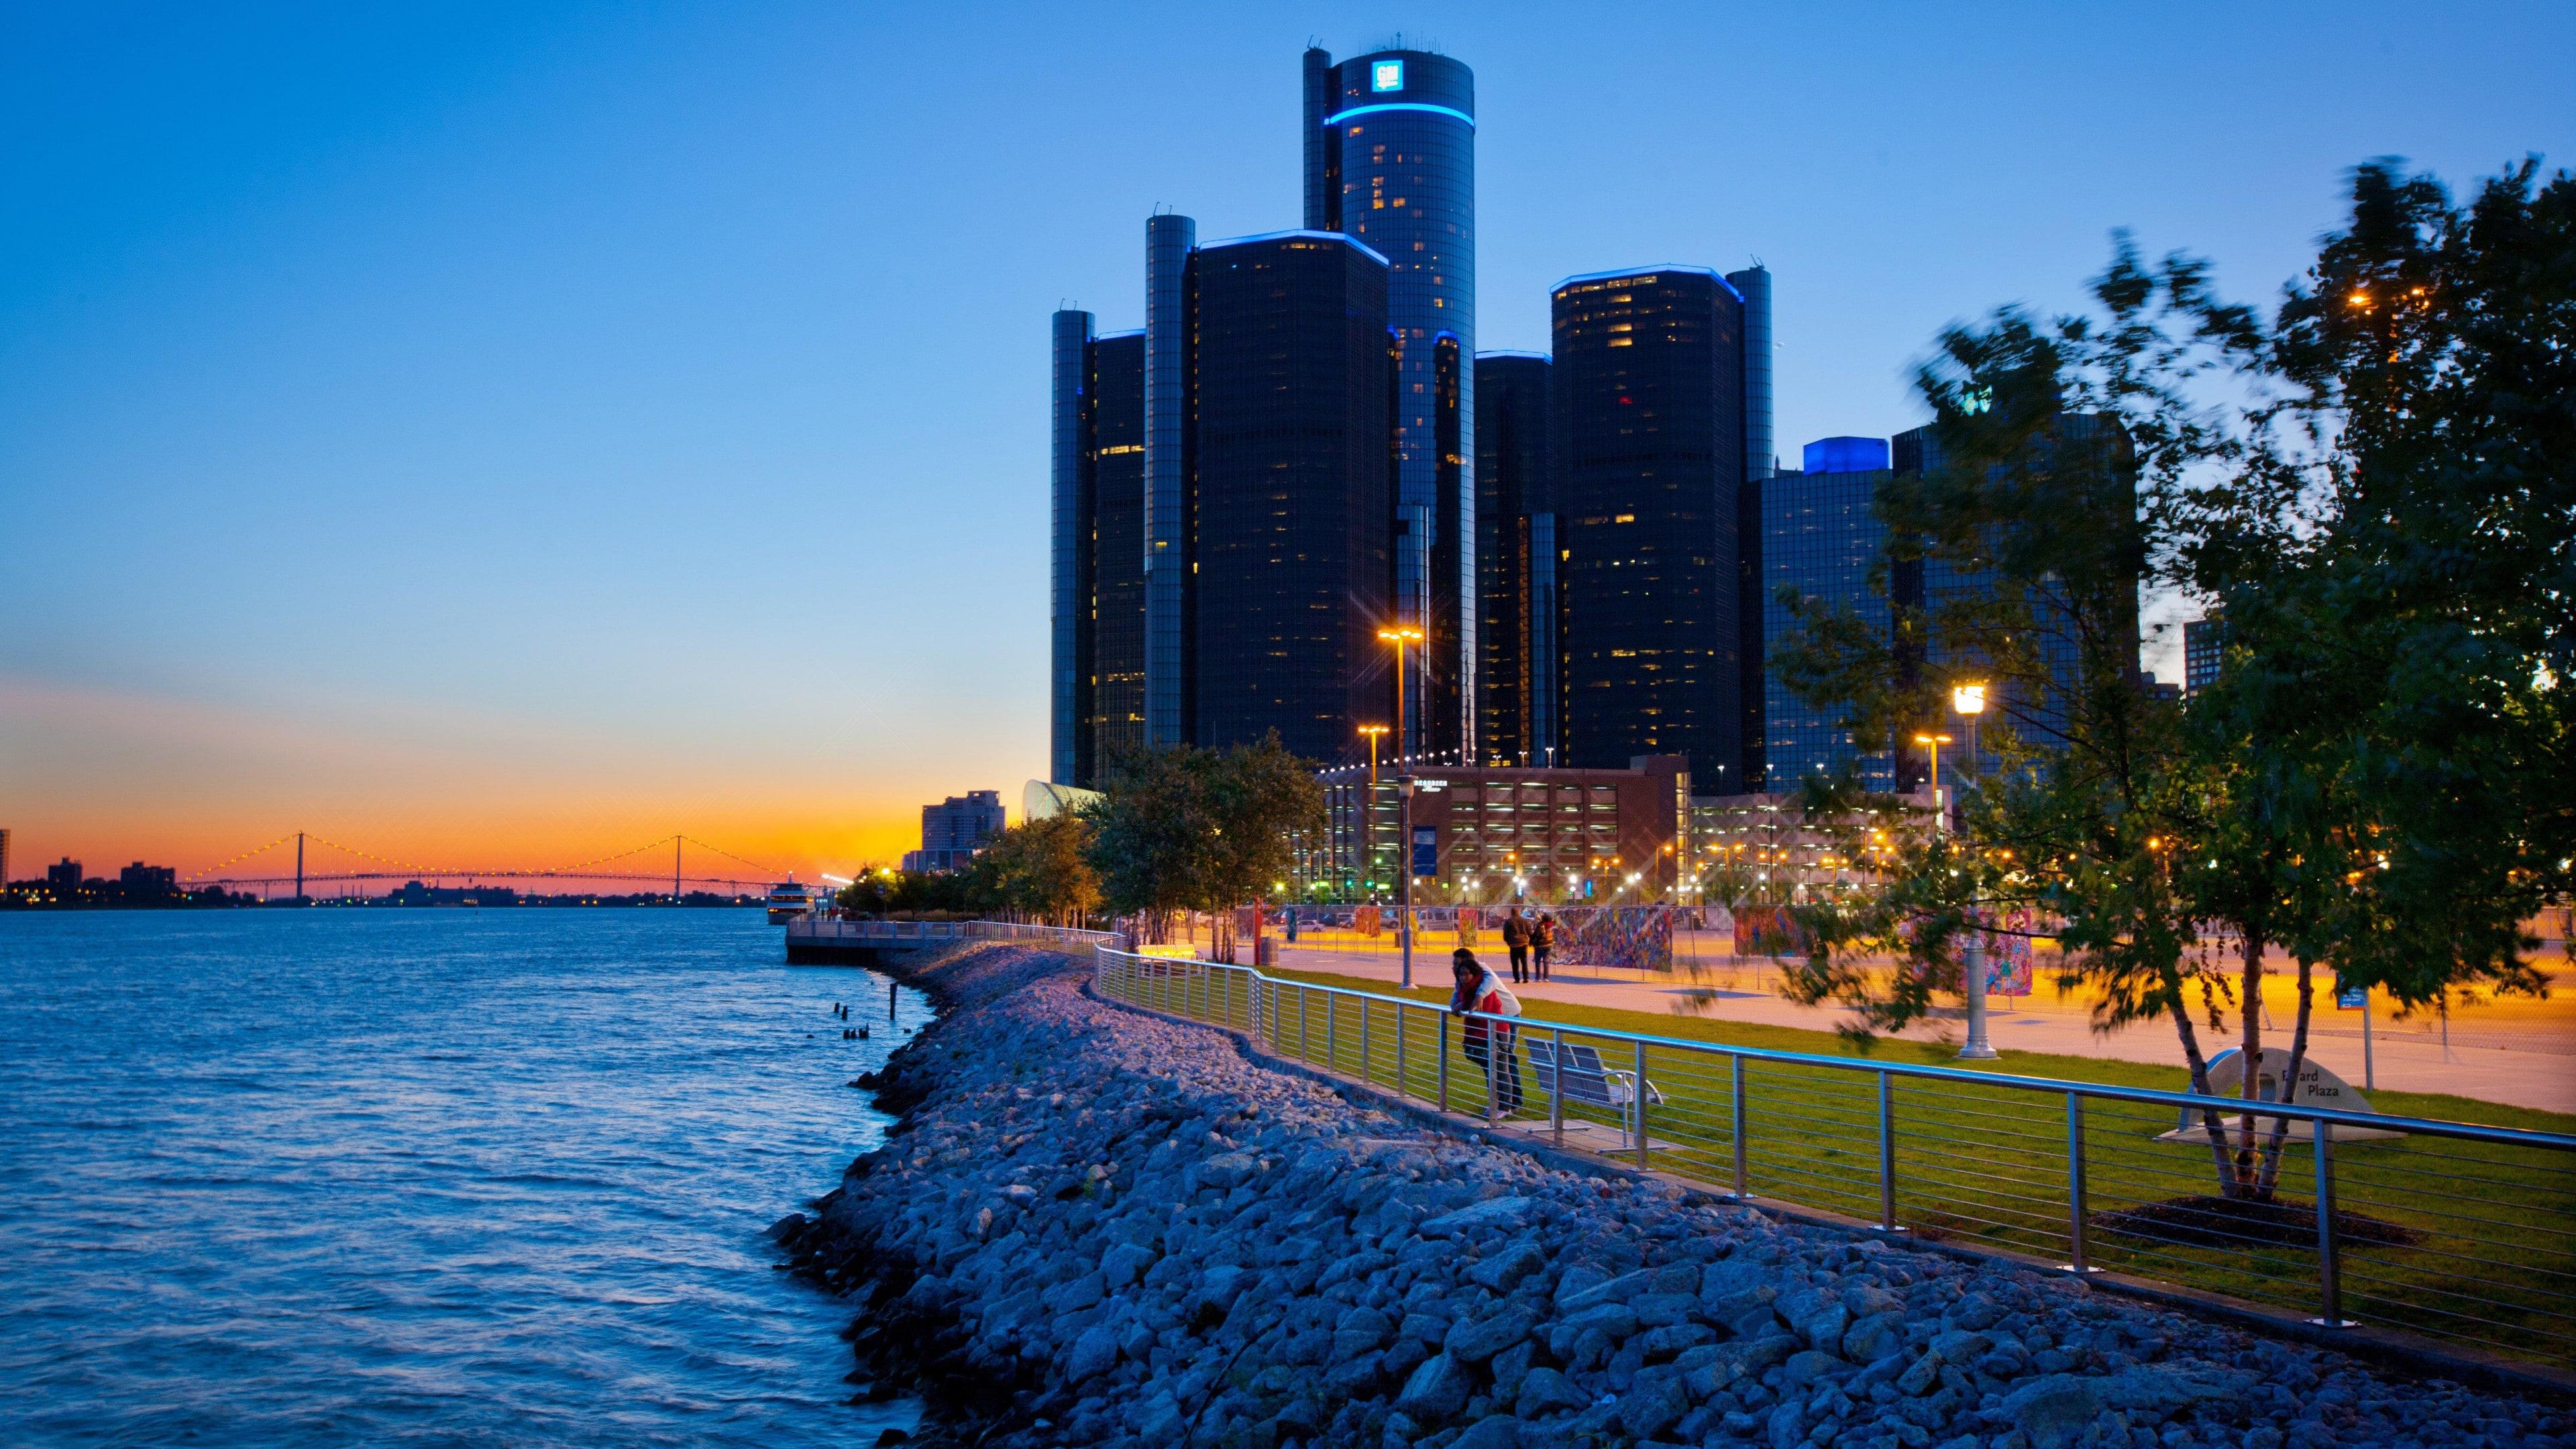 Detroit widescreen wallpapers